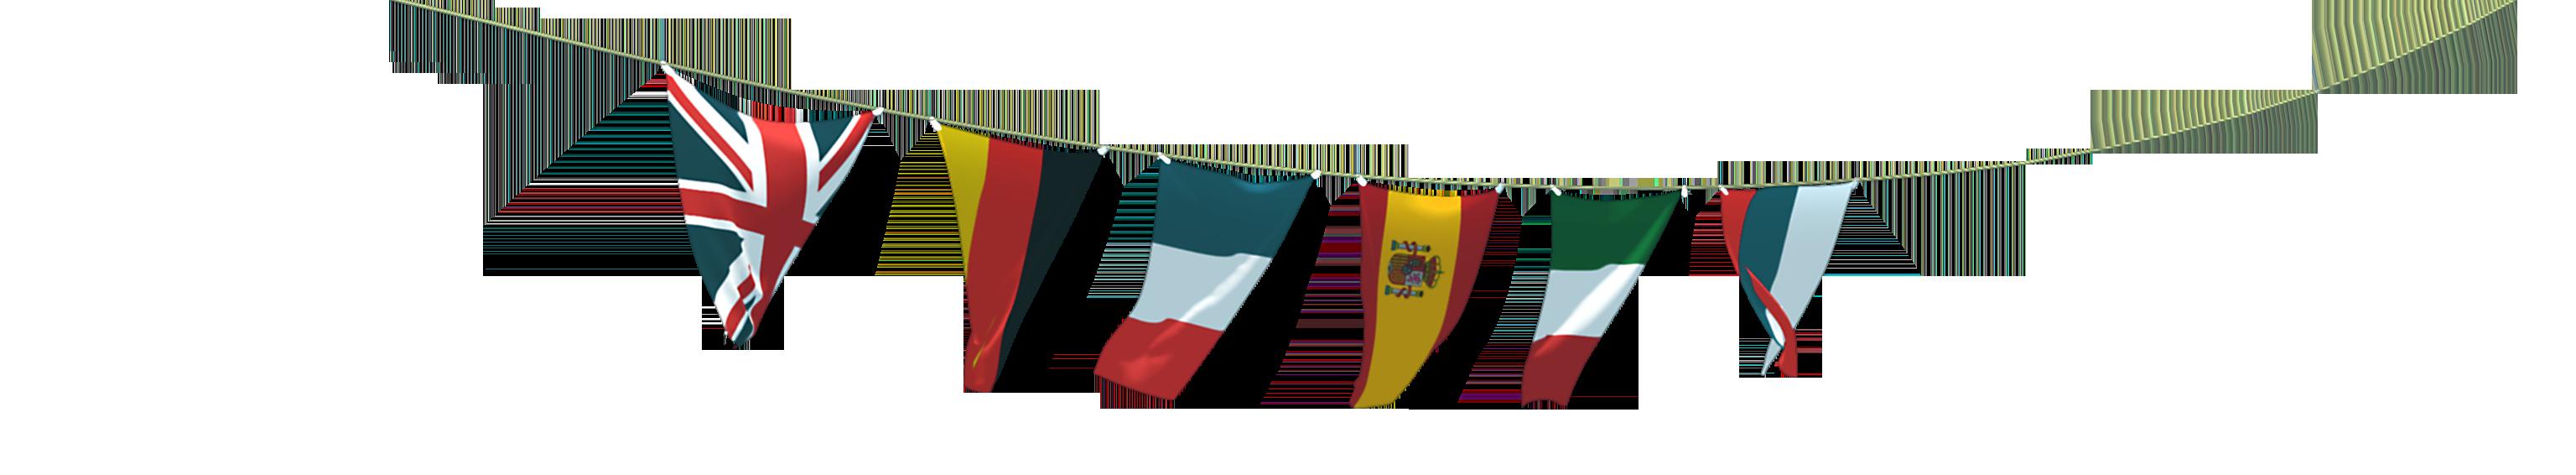 Flags_LAY_v002